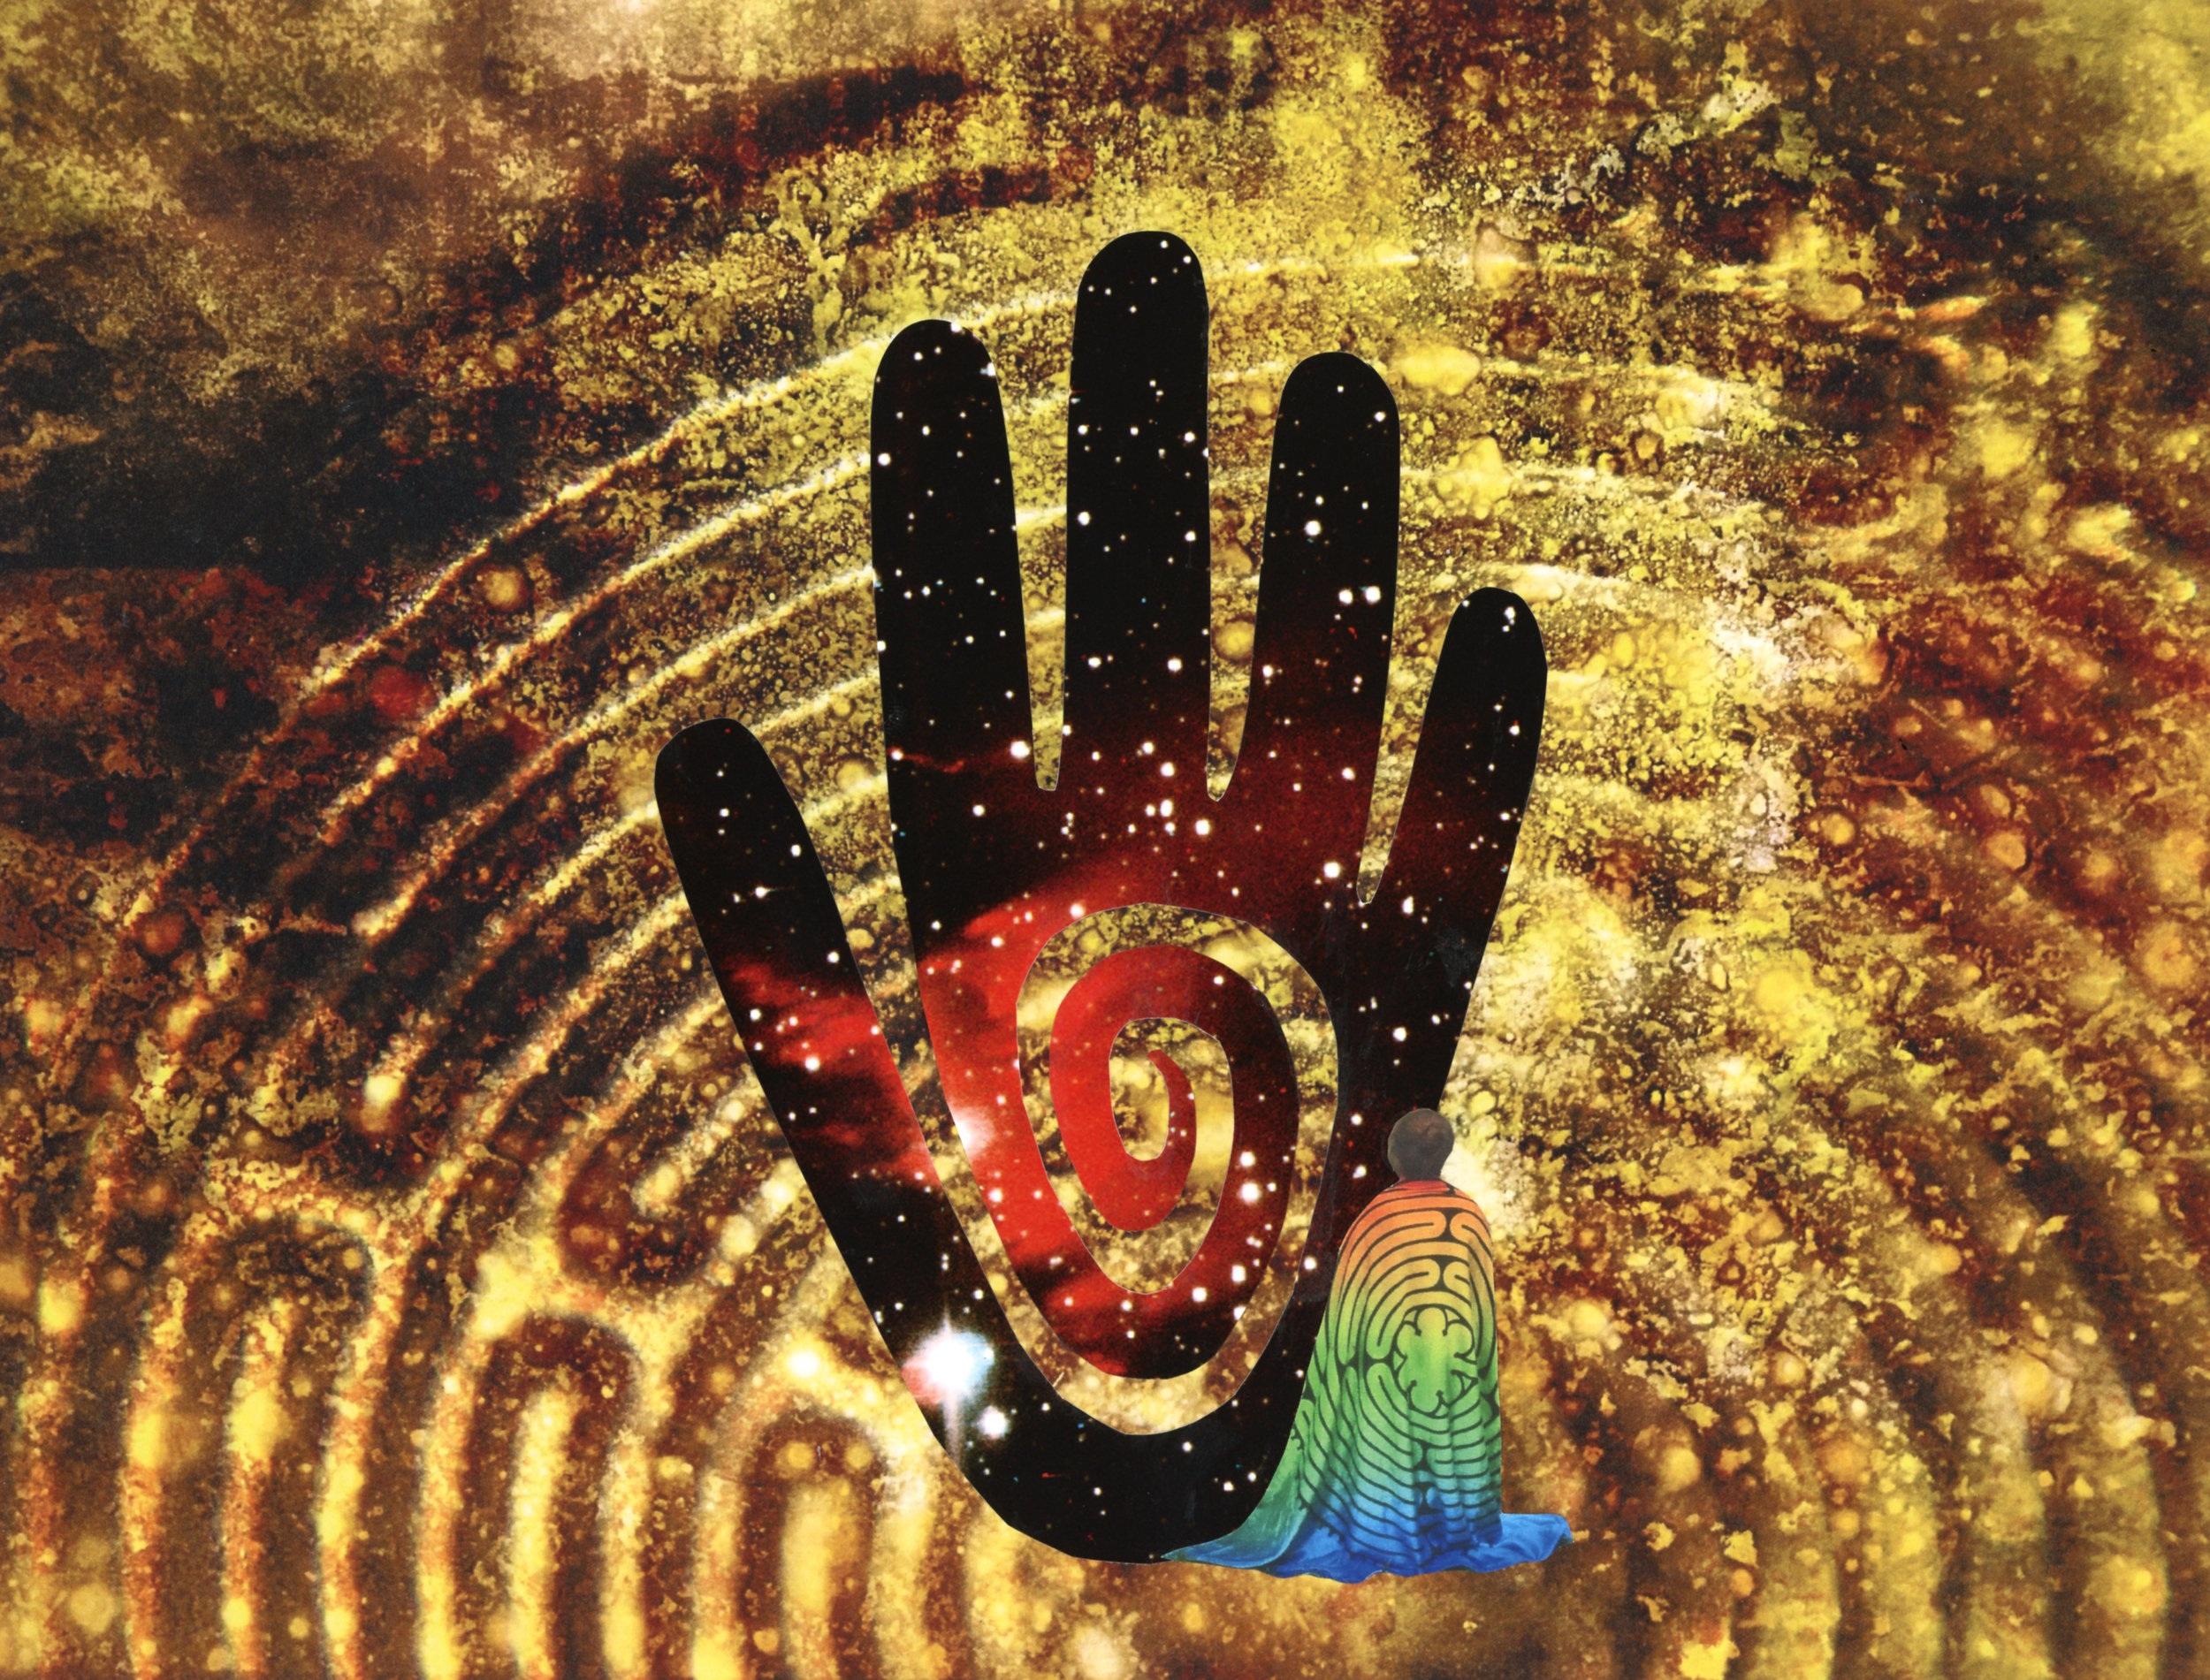 SC card labirinto catherine.jpg